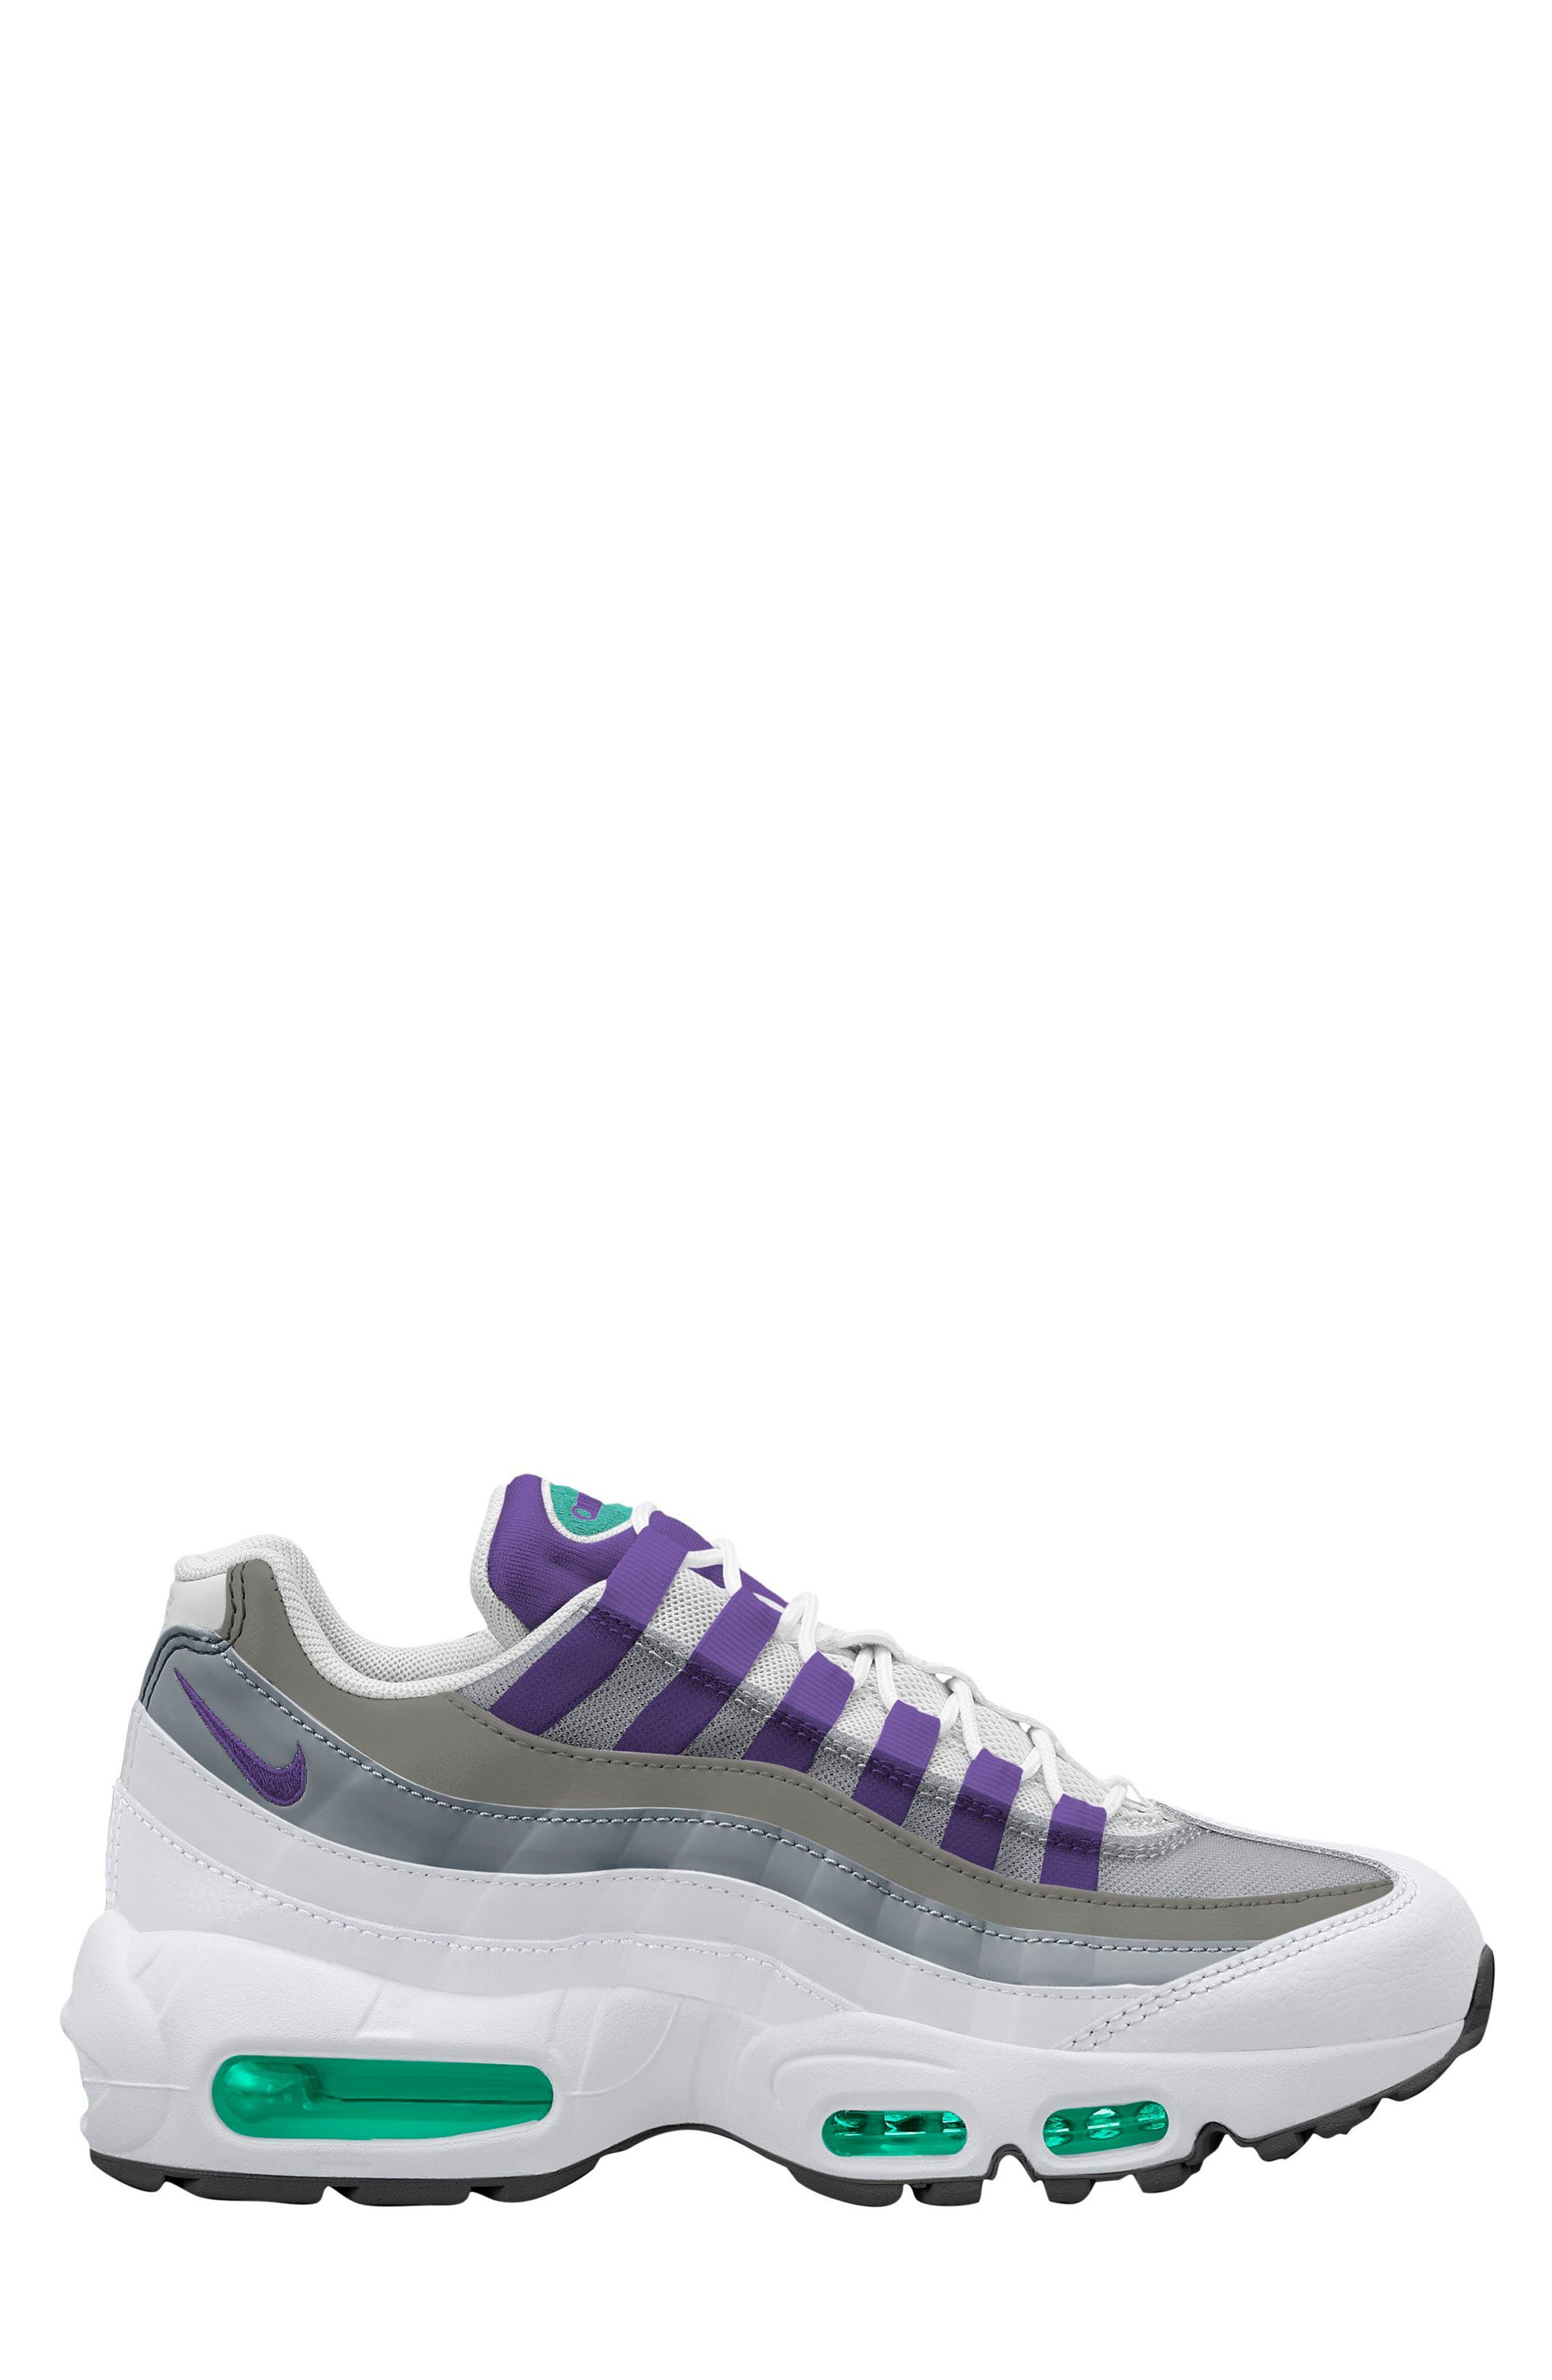 Air Max 95 Running Shoe,                             Main thumbnail 1, color,                             White/ Purple/ Emerald Green